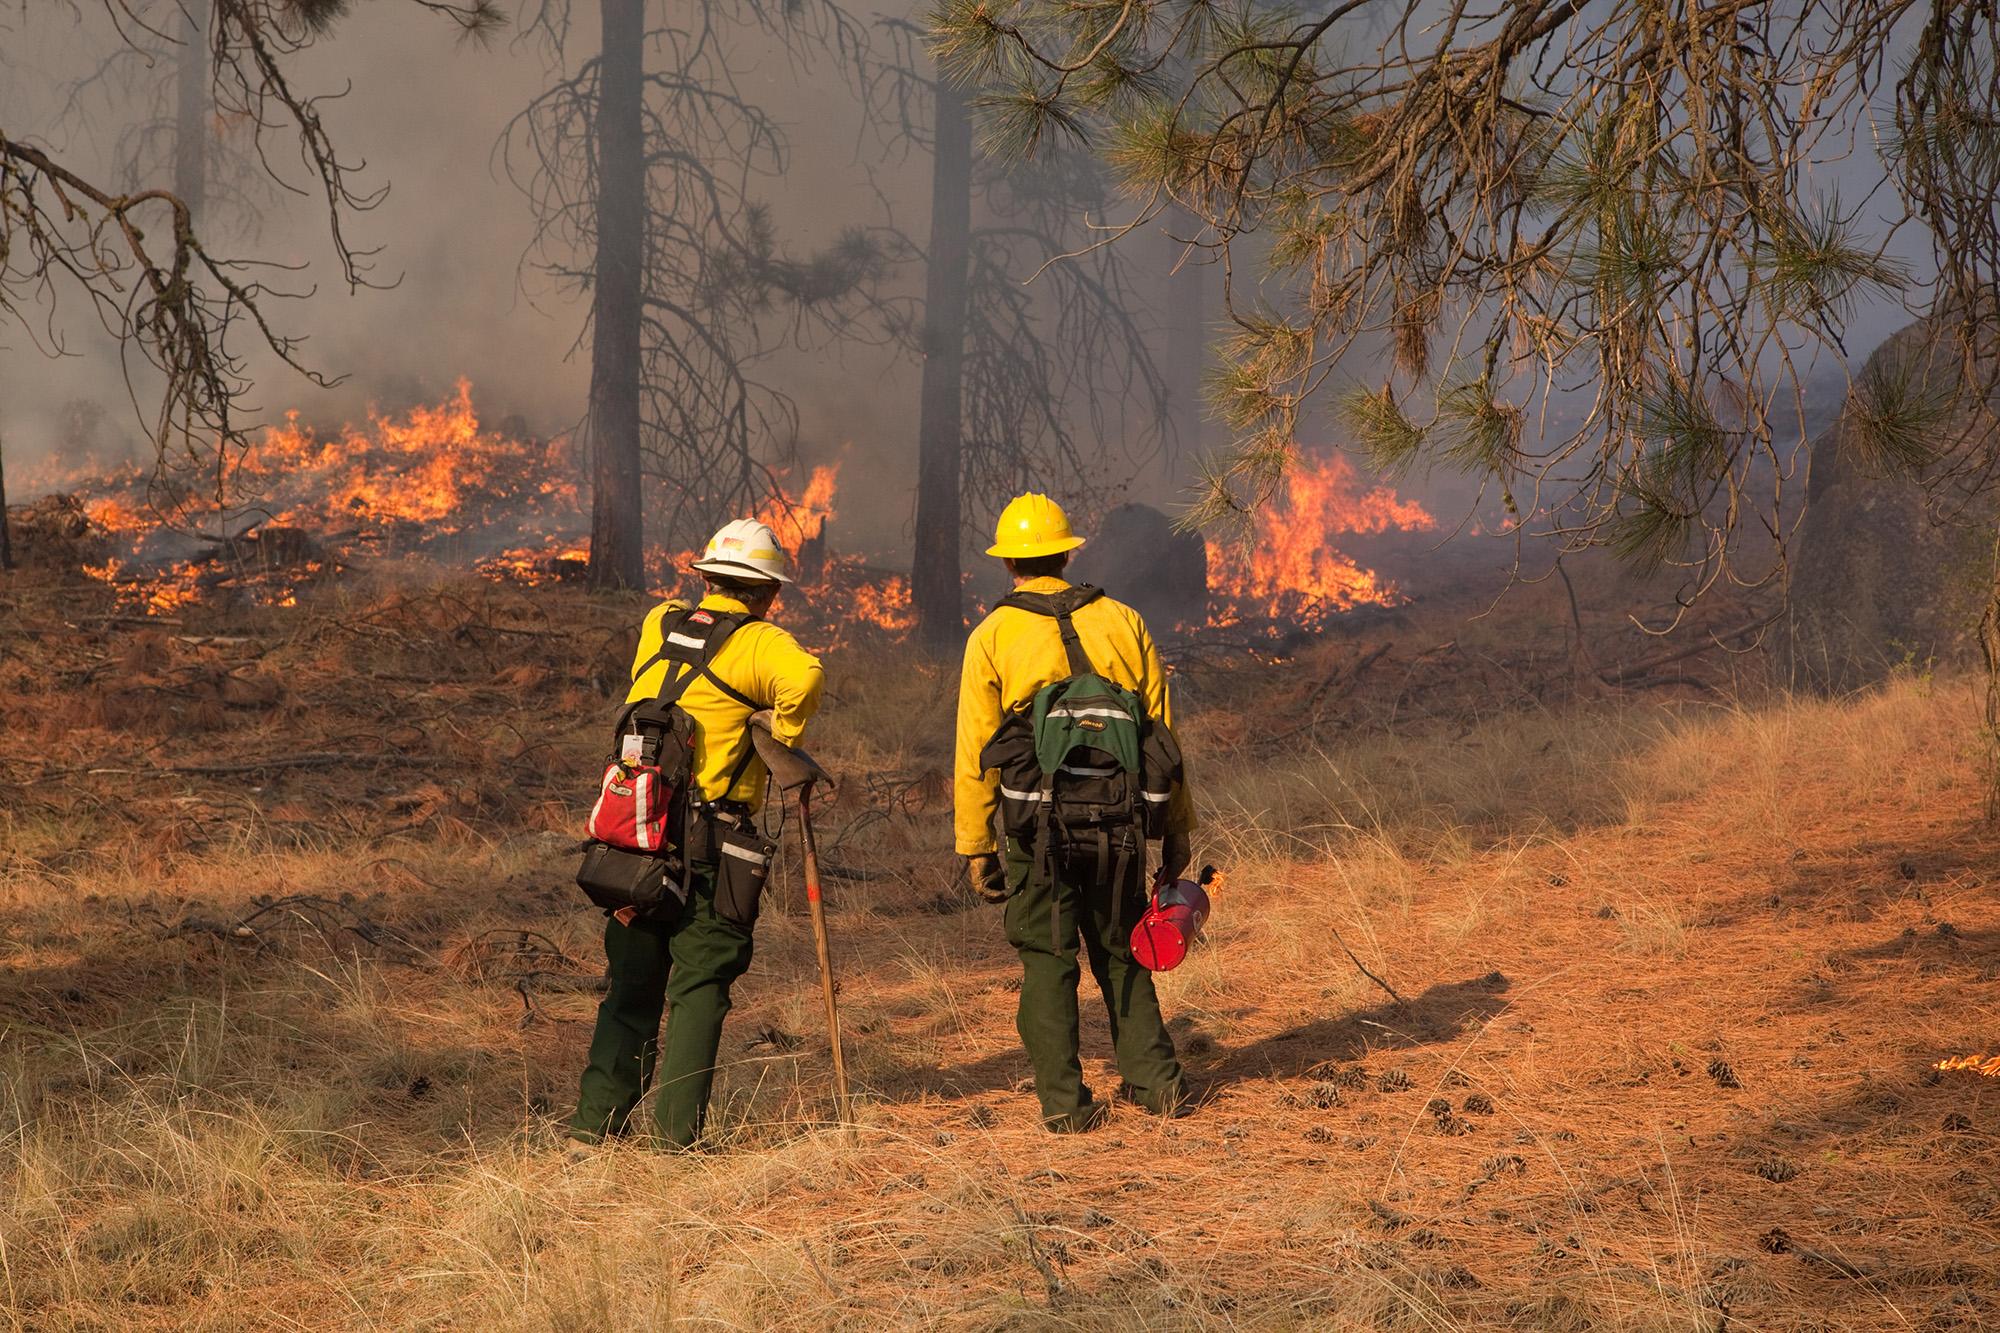 Prescribed fire in ponderosa pine forest in the Sinlahekin Wildlife Area in Okanogan County, Wash.Photo by John Marshall.